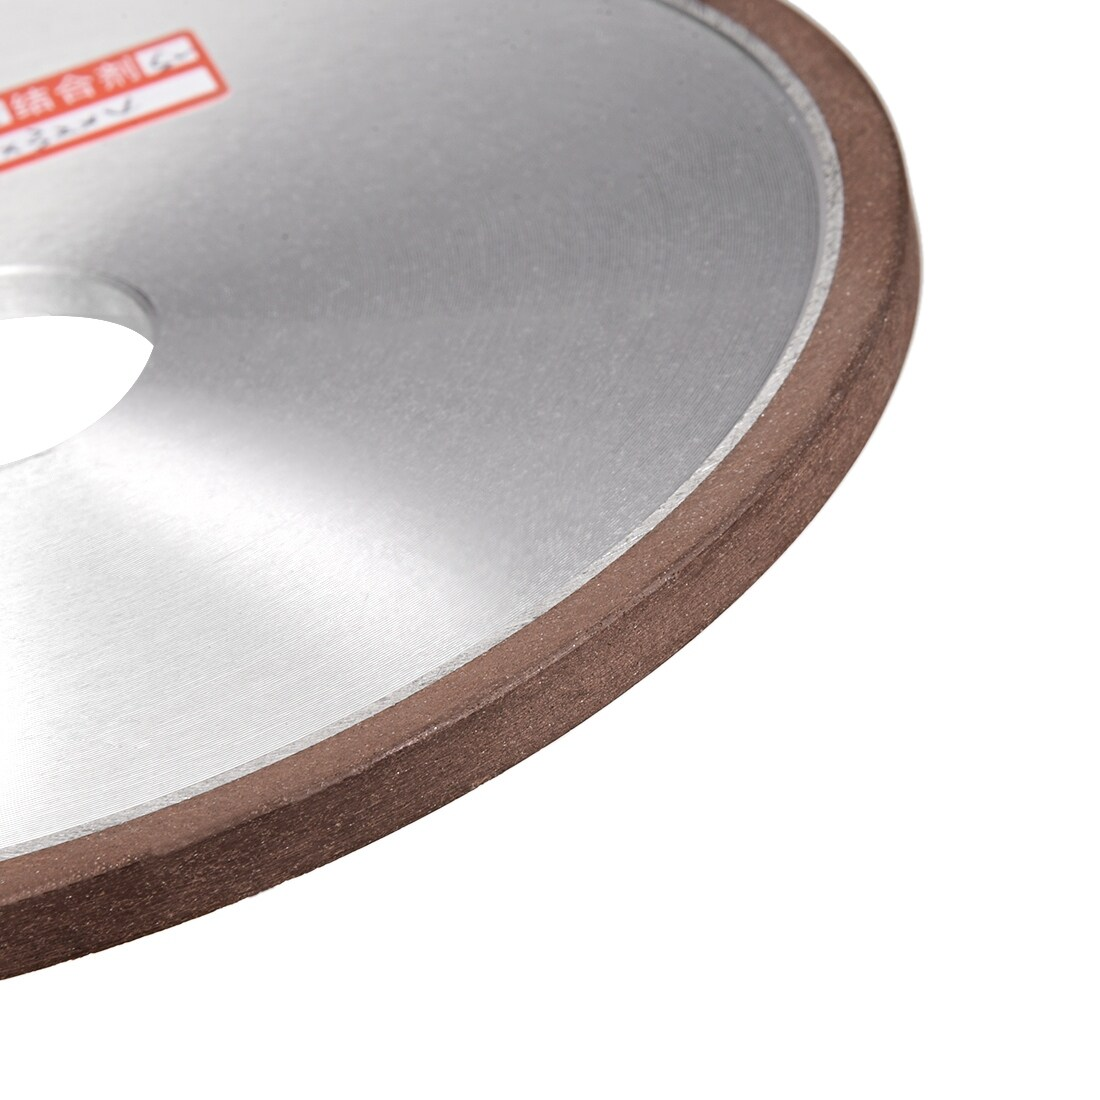 6Inch Diamond Grinding Wheel Grinder Wheels For Carbide Abrasive Grit 150